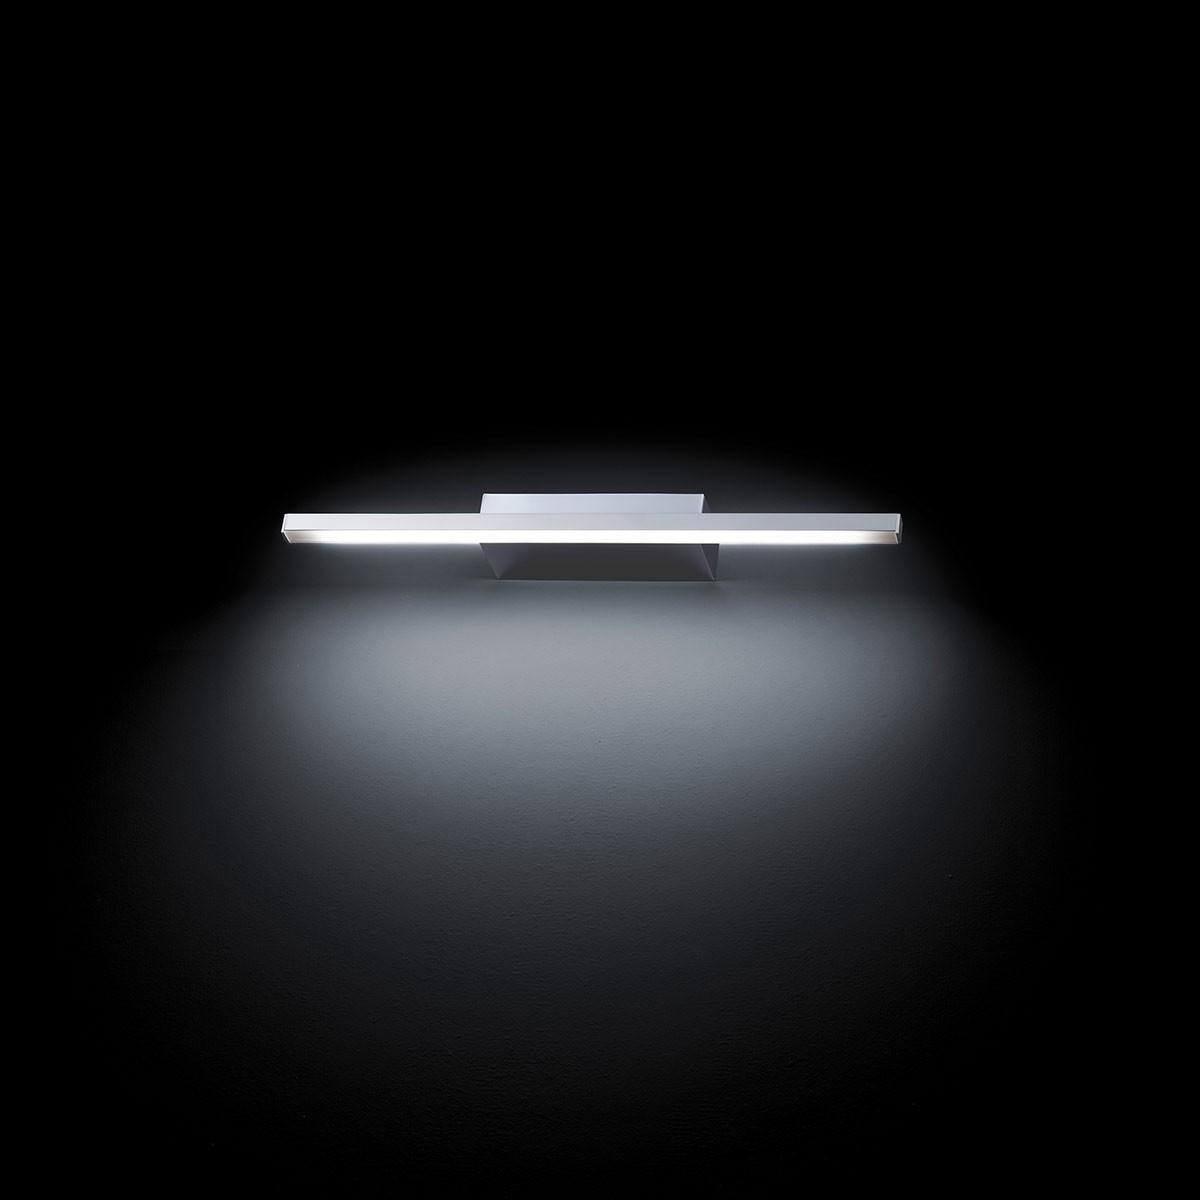 Grossmann Forte LED Wandleuchte, Länge: 49,4 cm, Chrom